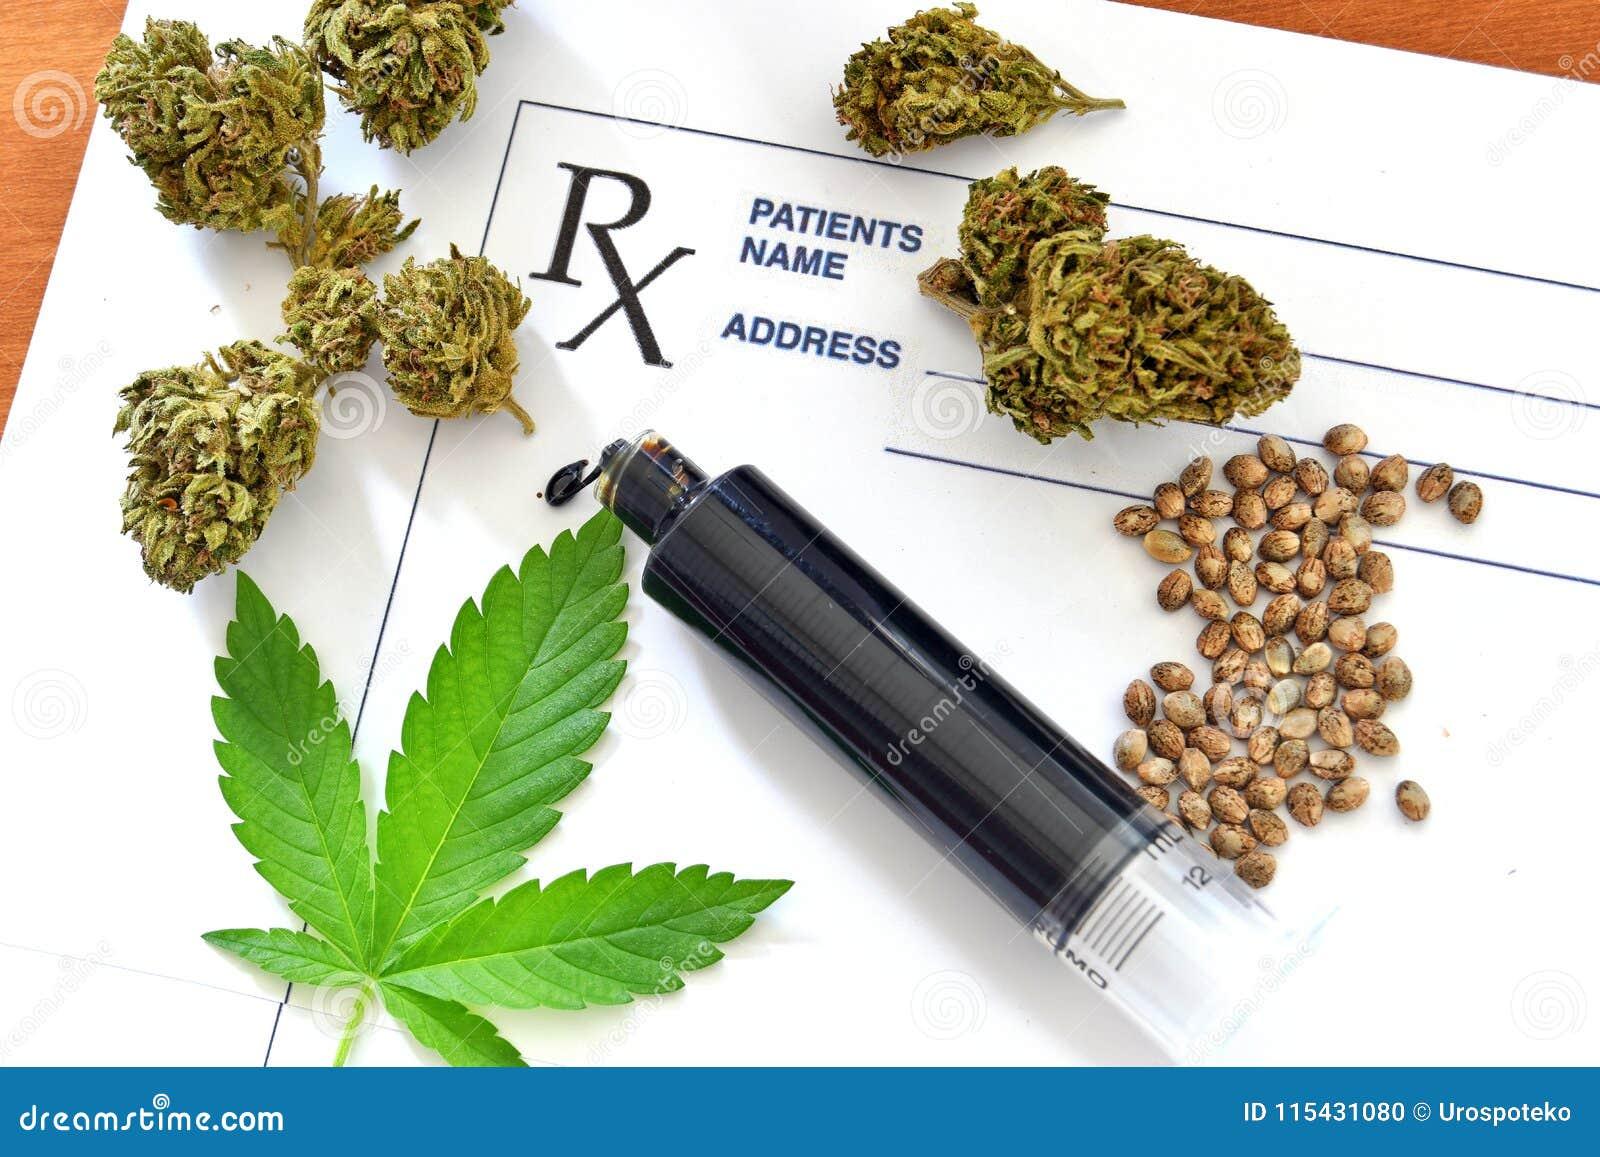 Hash oil with medical cannabis, cannabis seeds and prescription